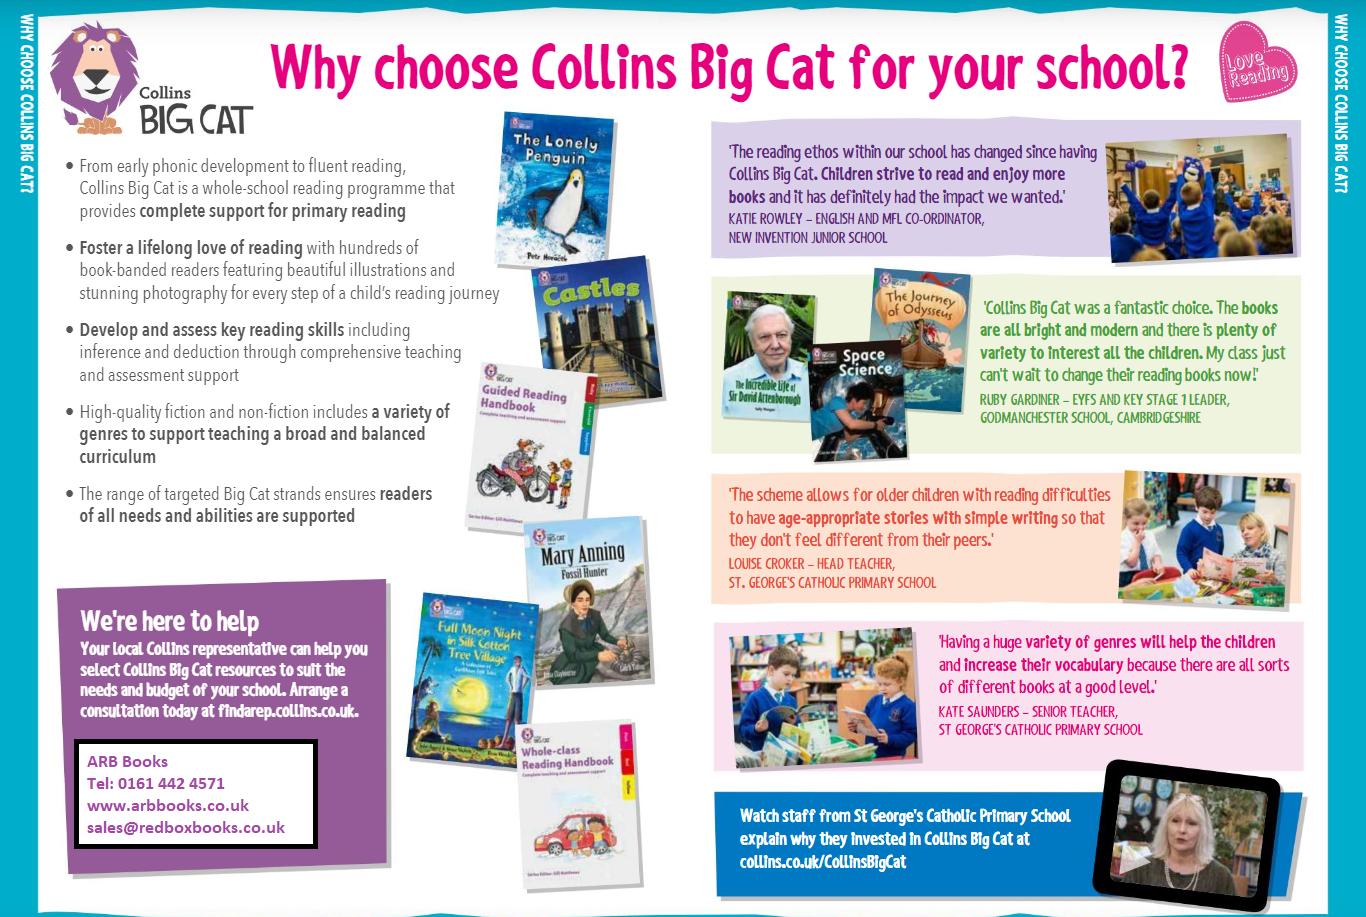 Why choose Collins Big Cat